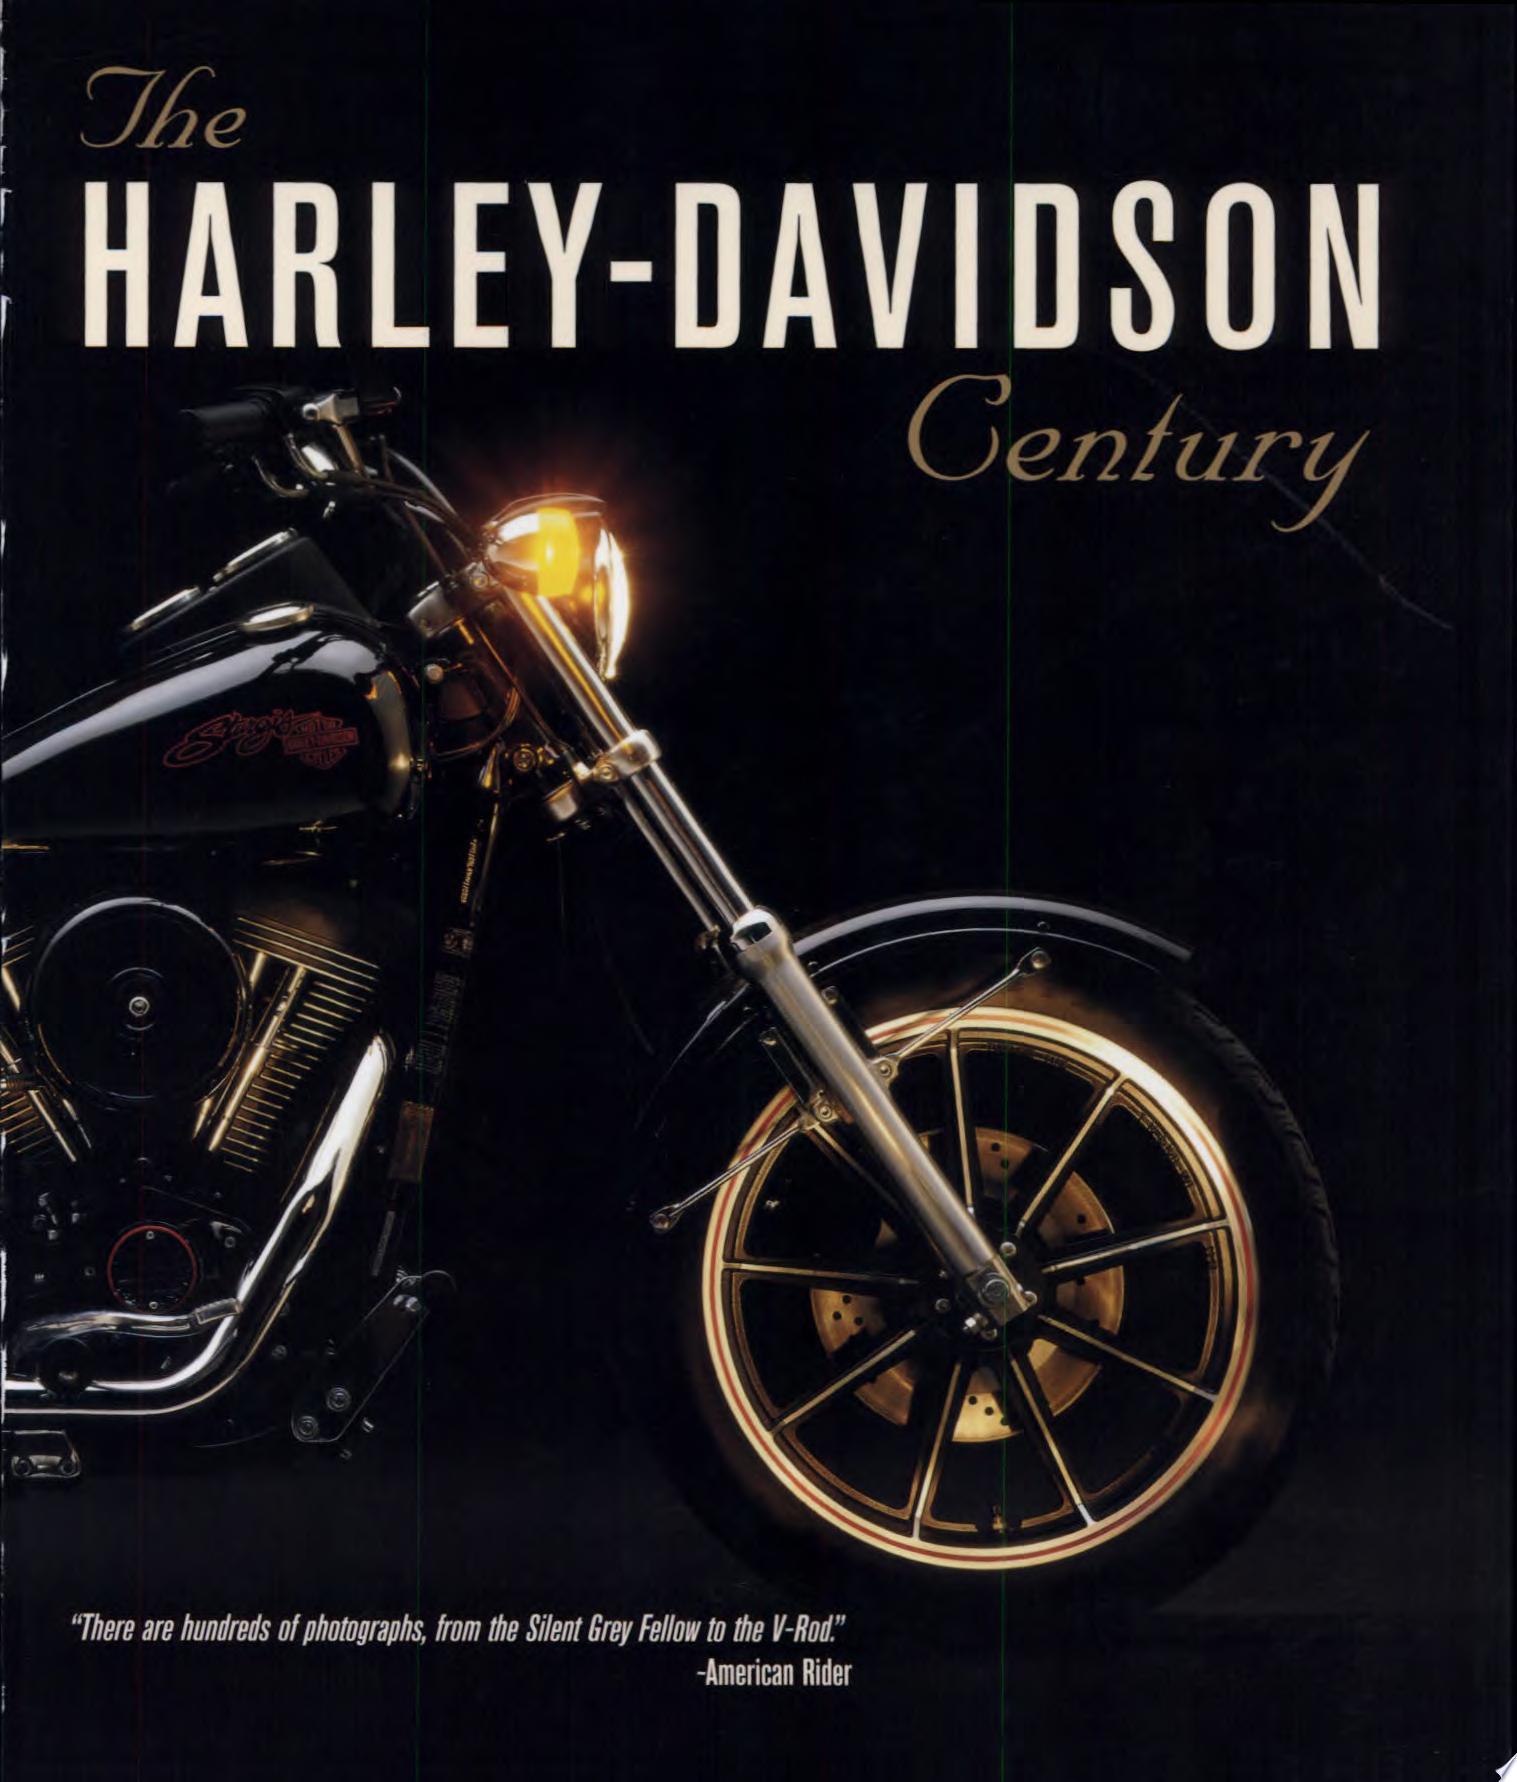 Harley Davidson Century